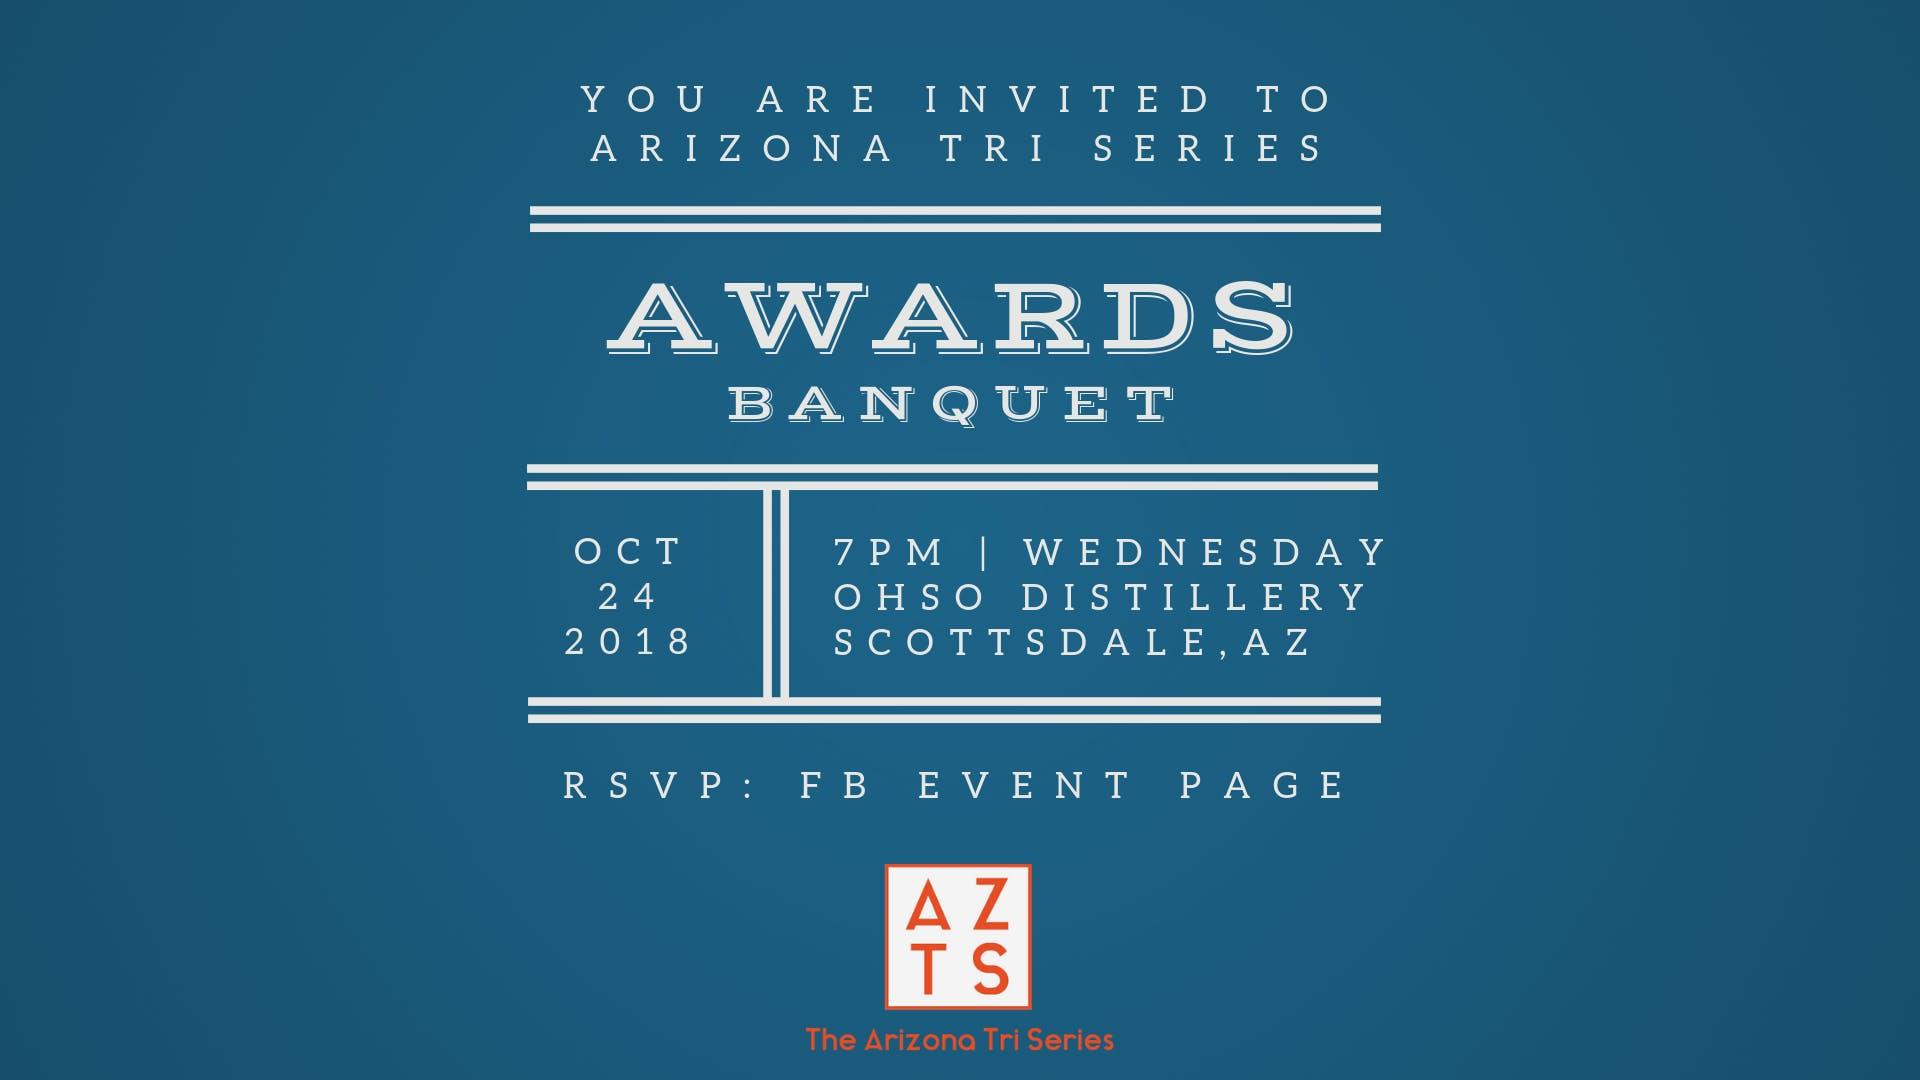 Arizona Tri Series Awards Banquet